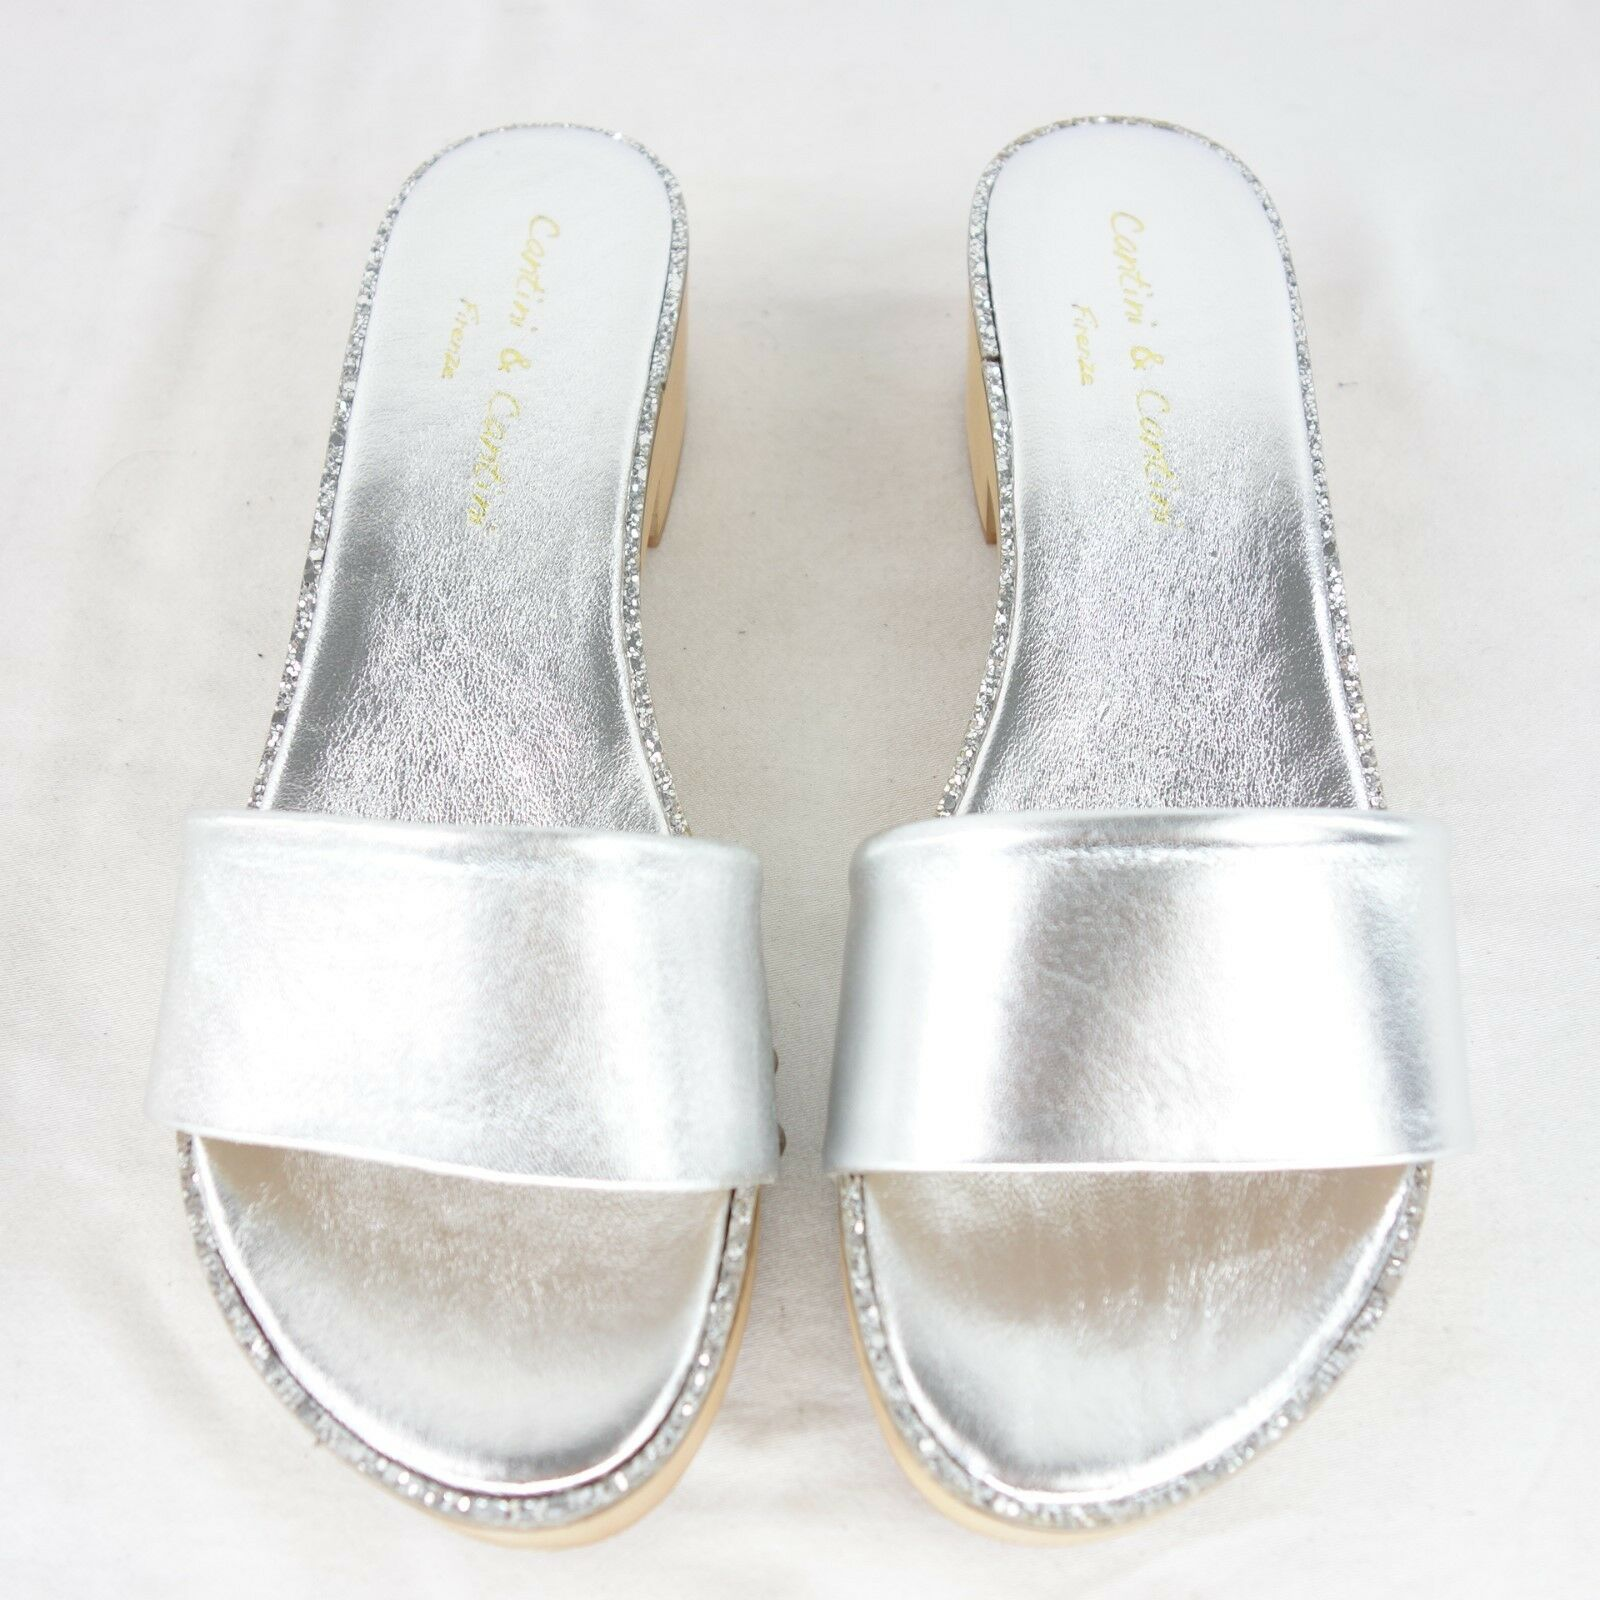 CANTINI & CANTINI Firenze Damen Pantoletten Clogs Gr 40 NEU Leder Schuhe NP 105 NEU 40 c0b7c2